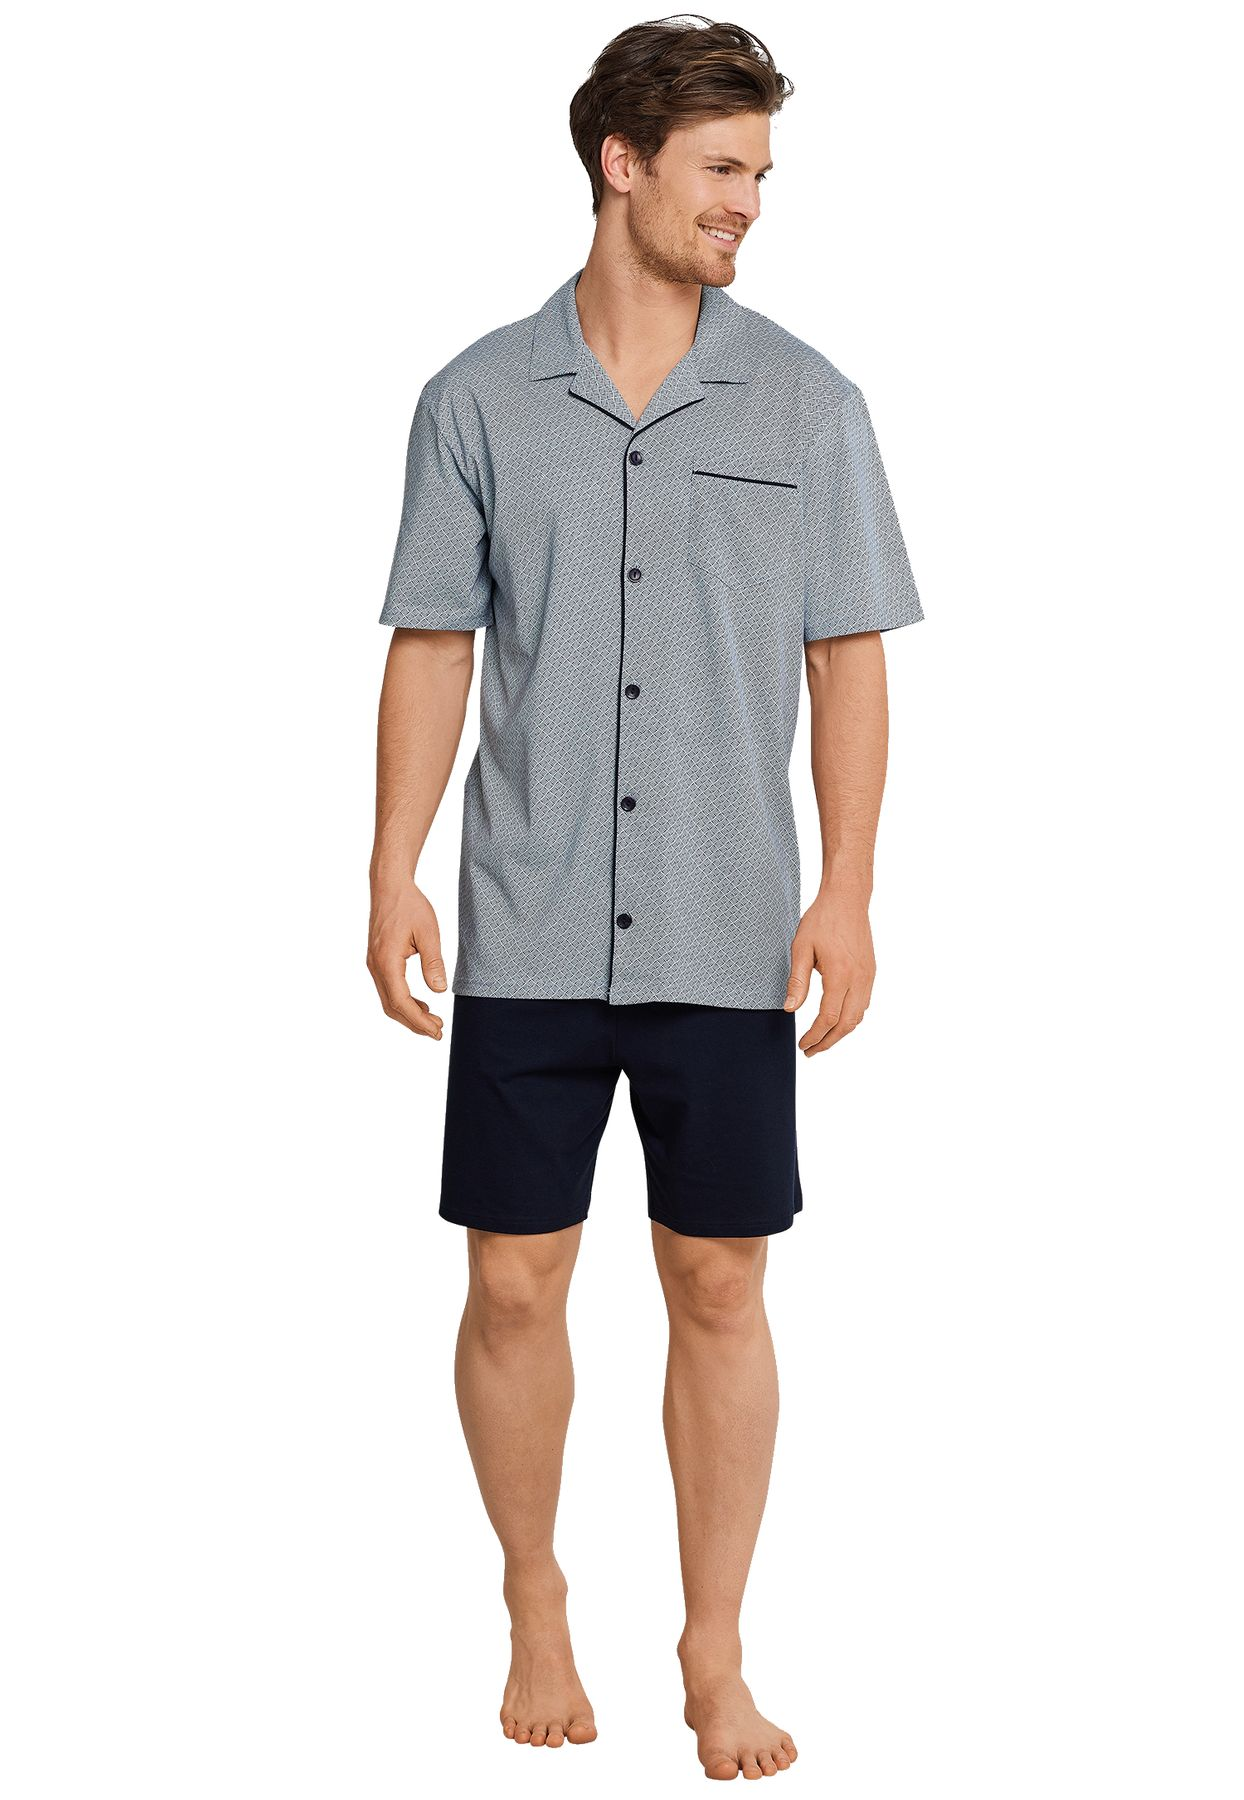 Schiesser - Herren Pyjama kurz Jersey Knopfleiste blau gemustert (163638-803) – Bild 1